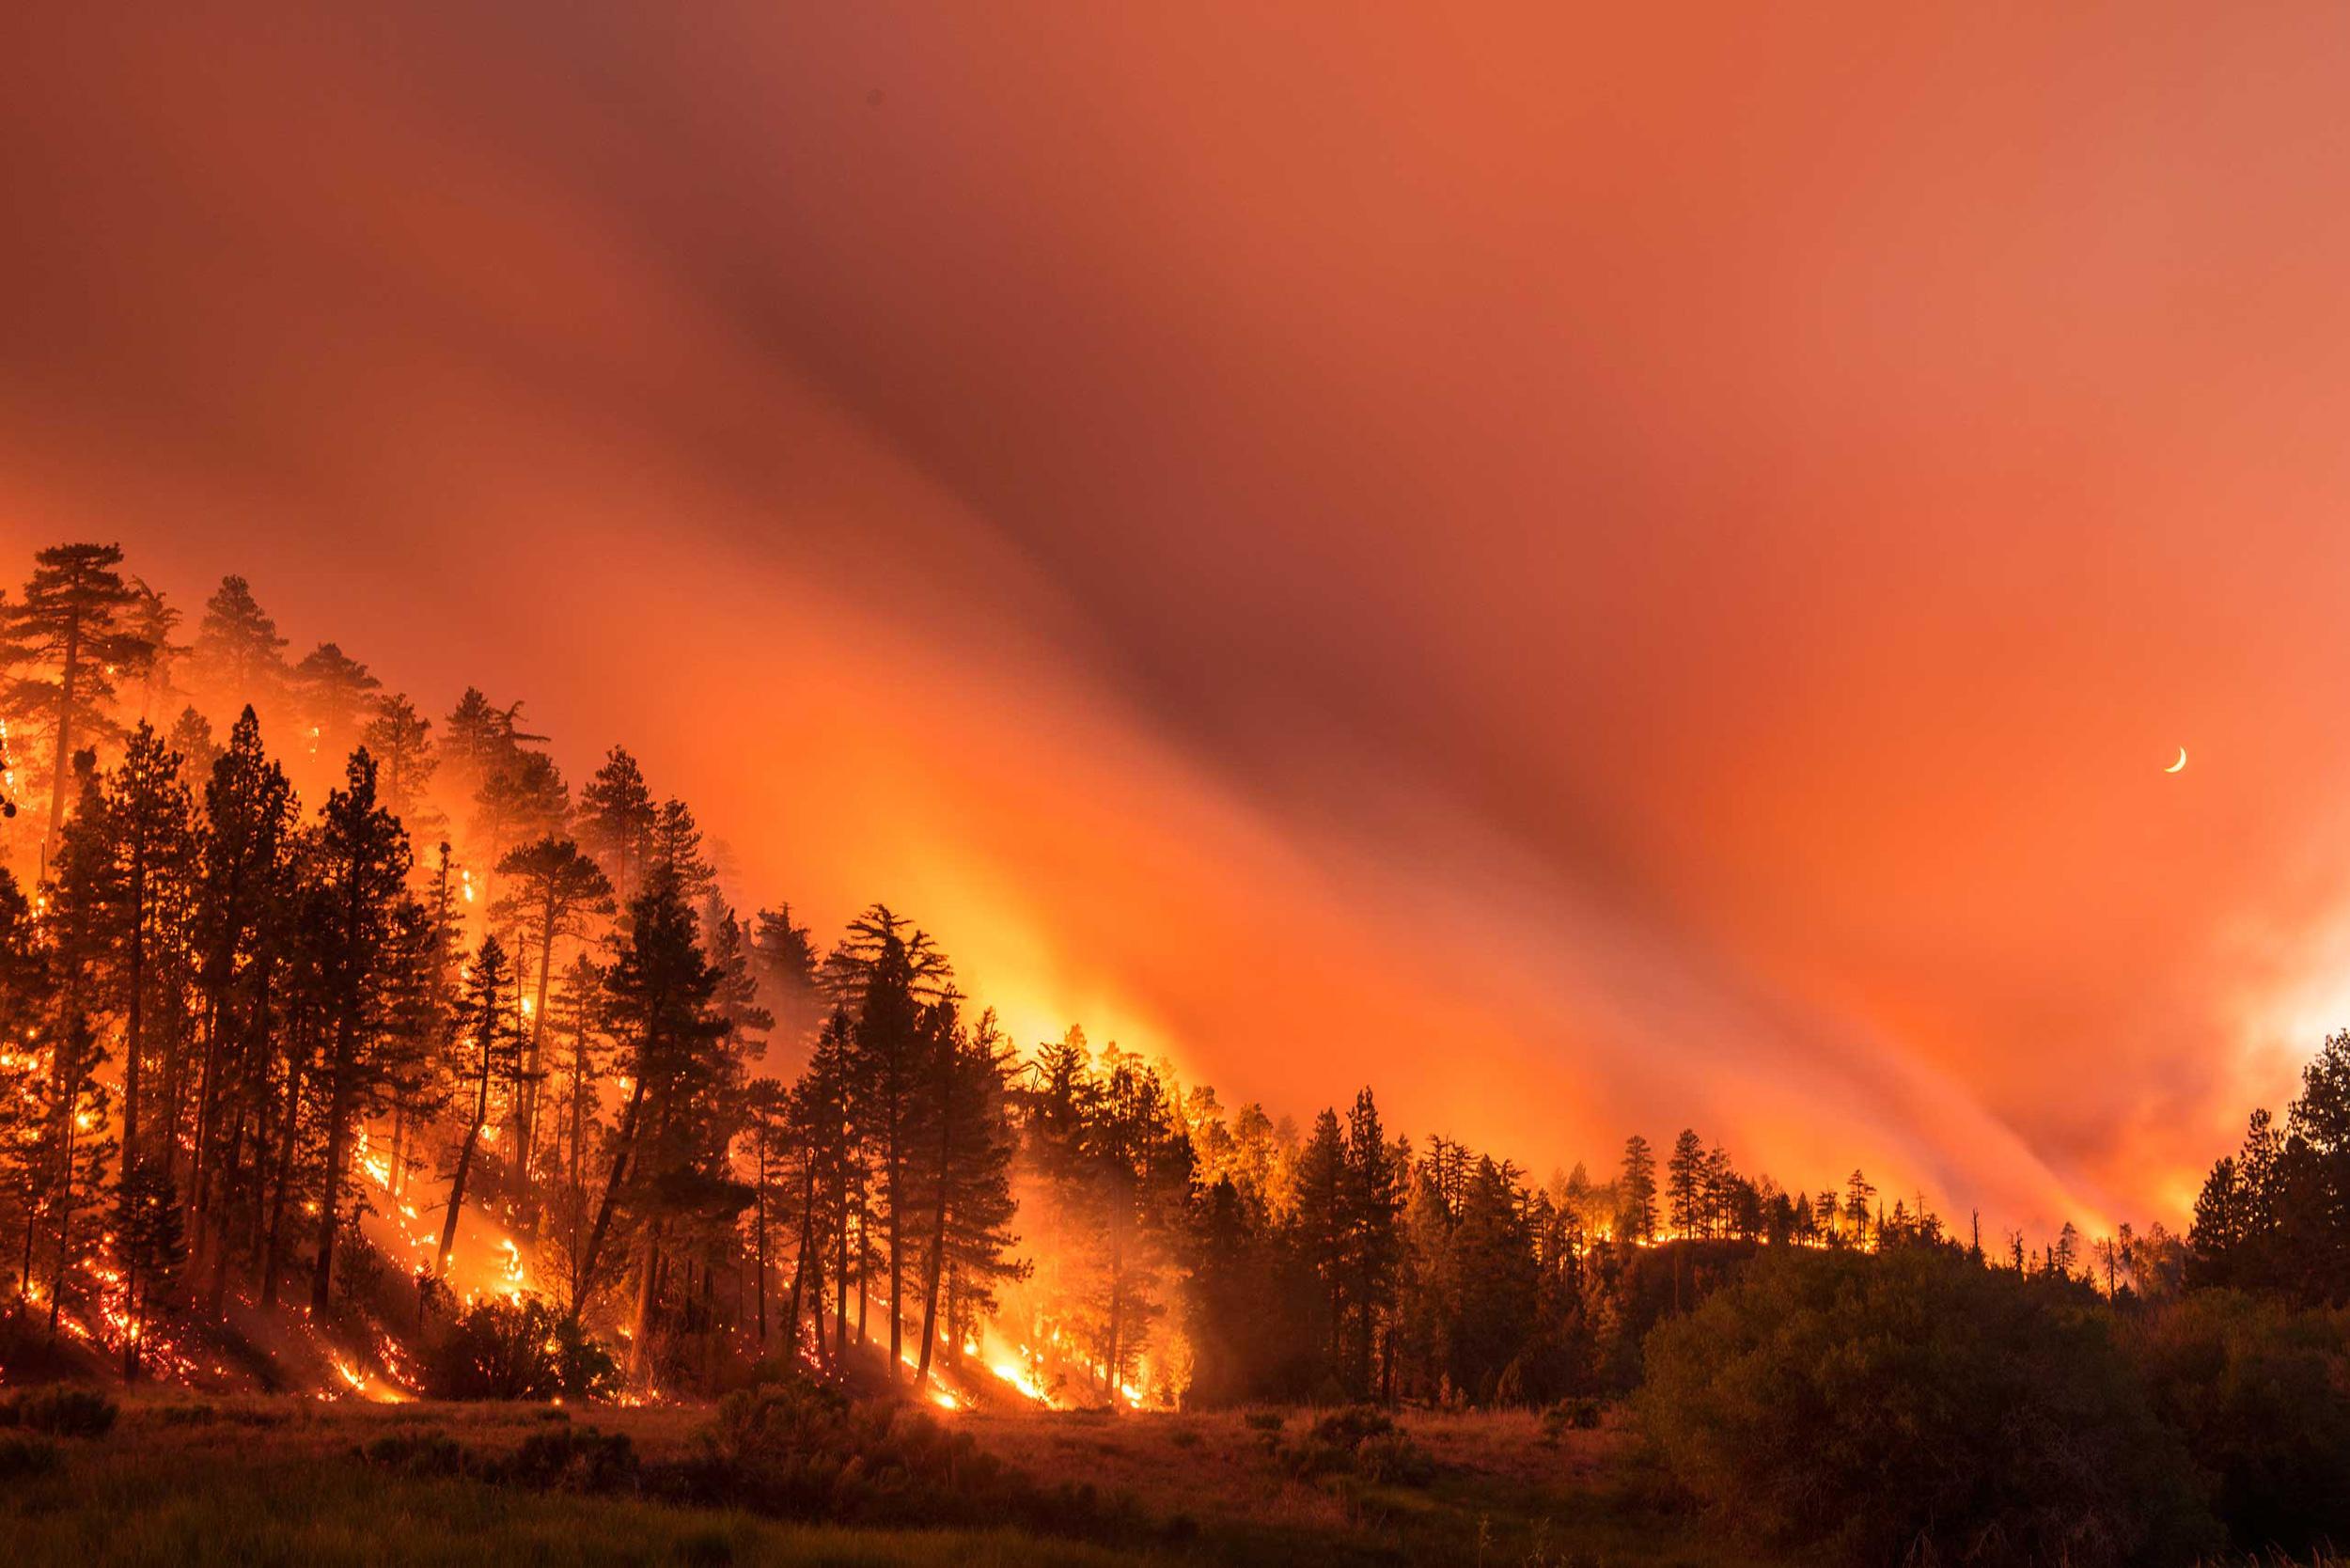 The Lake Fire burns in the San Bernardino National Forest in California on June 18, 2015.